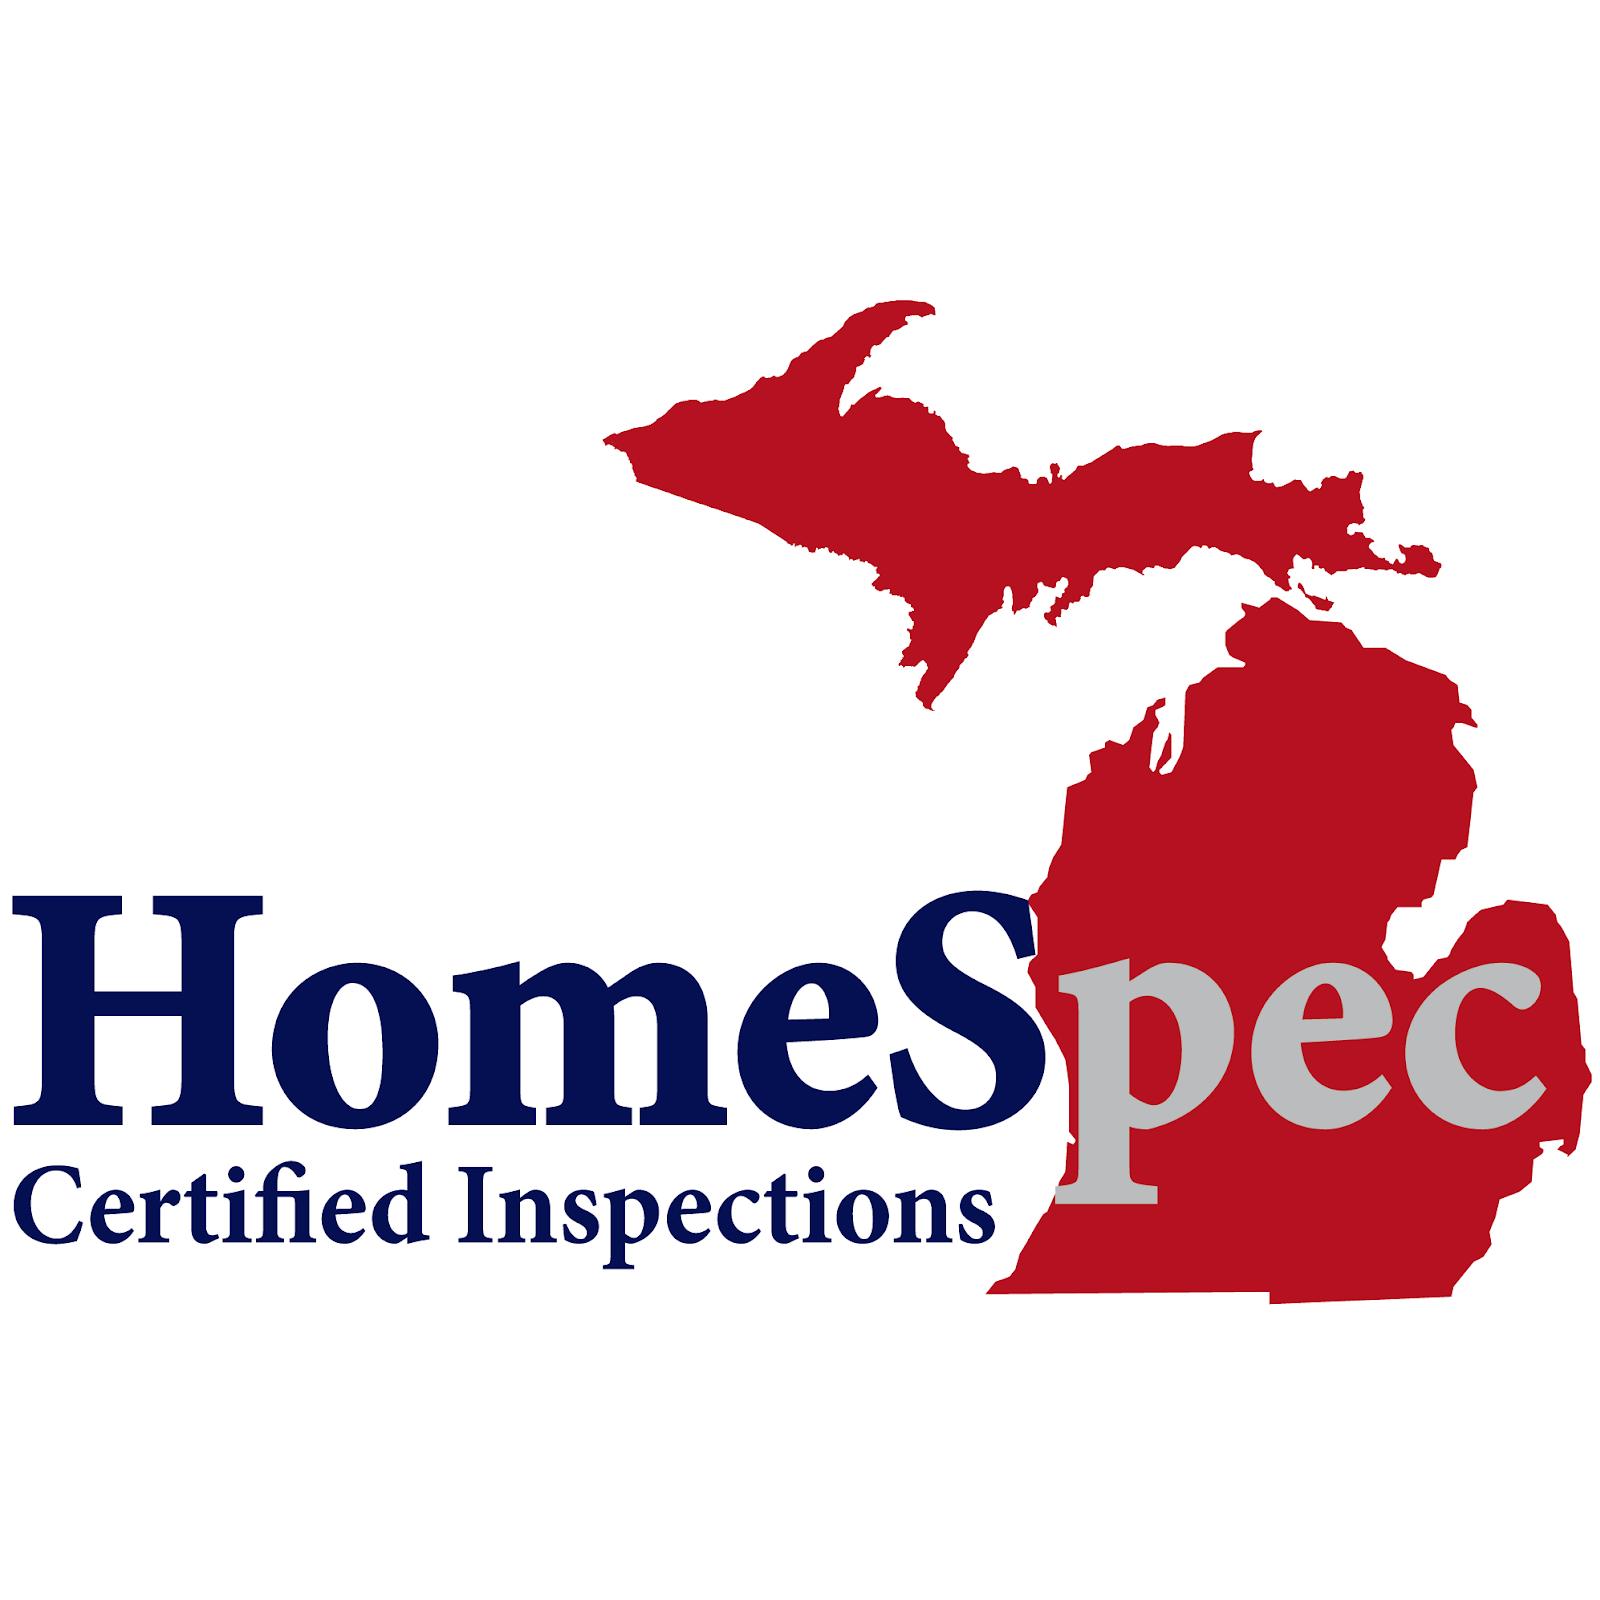 HomeSpec Certified Inspections, LLC - Richland, MI 49083 - (269)425-1203 | ShowMeLocal.com